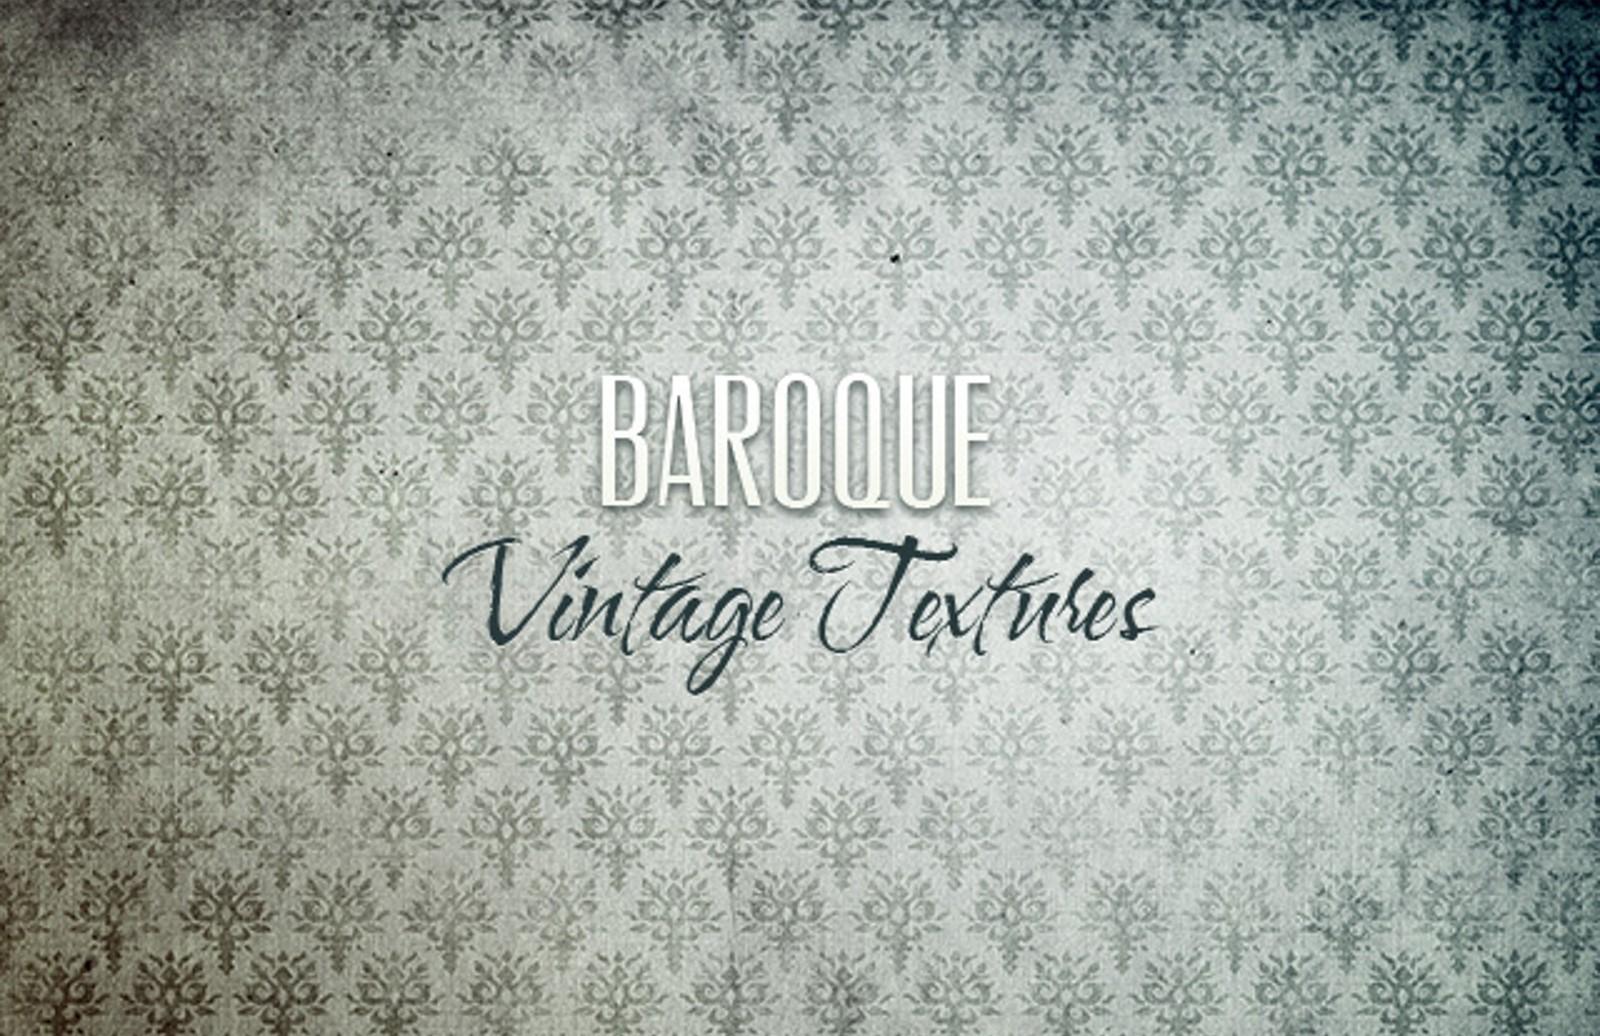 Vintage  Baroque  Textures  Preview1